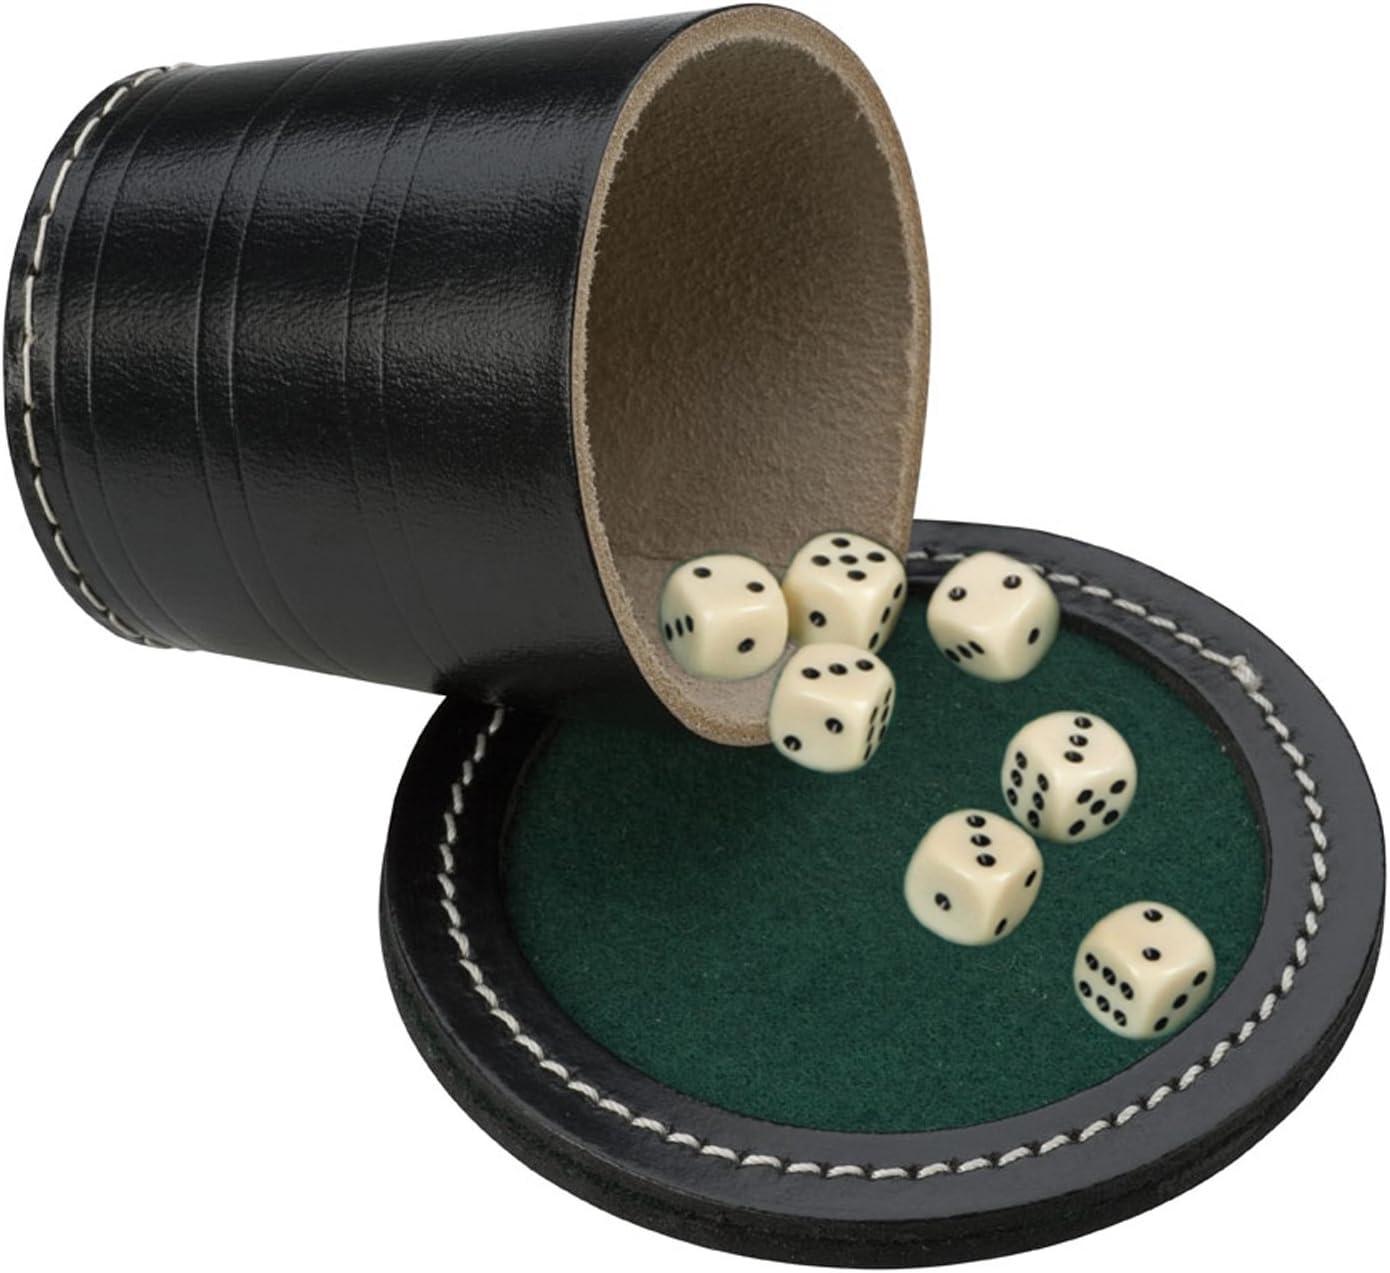 Engelhart H.O. B.V. 3006099cm Cuero Negro Poker Taza con Tapa Incluye 18mm 6Dados